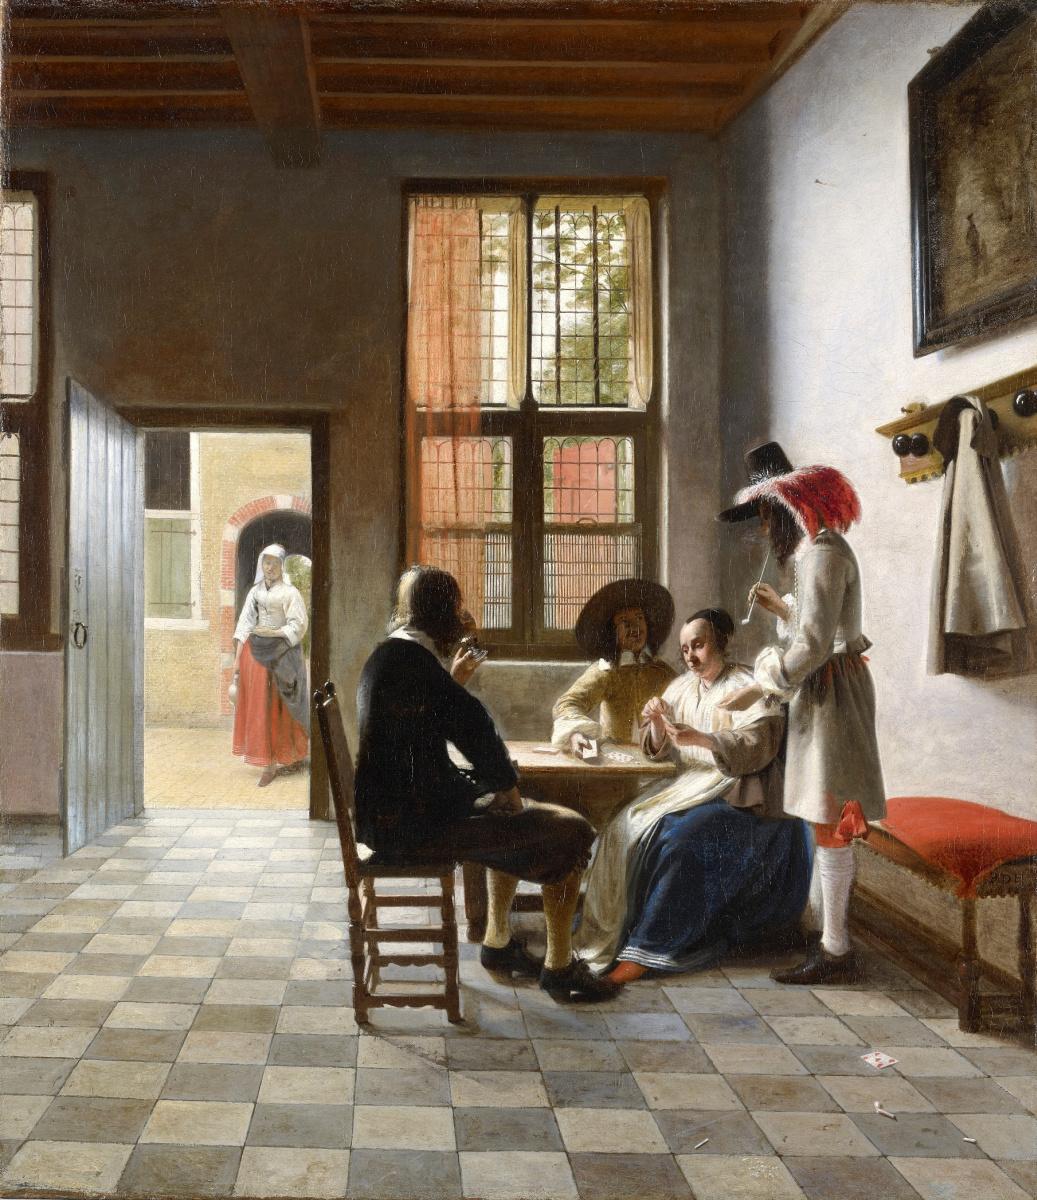 Pieter de Hooch. Card players in a sunny room